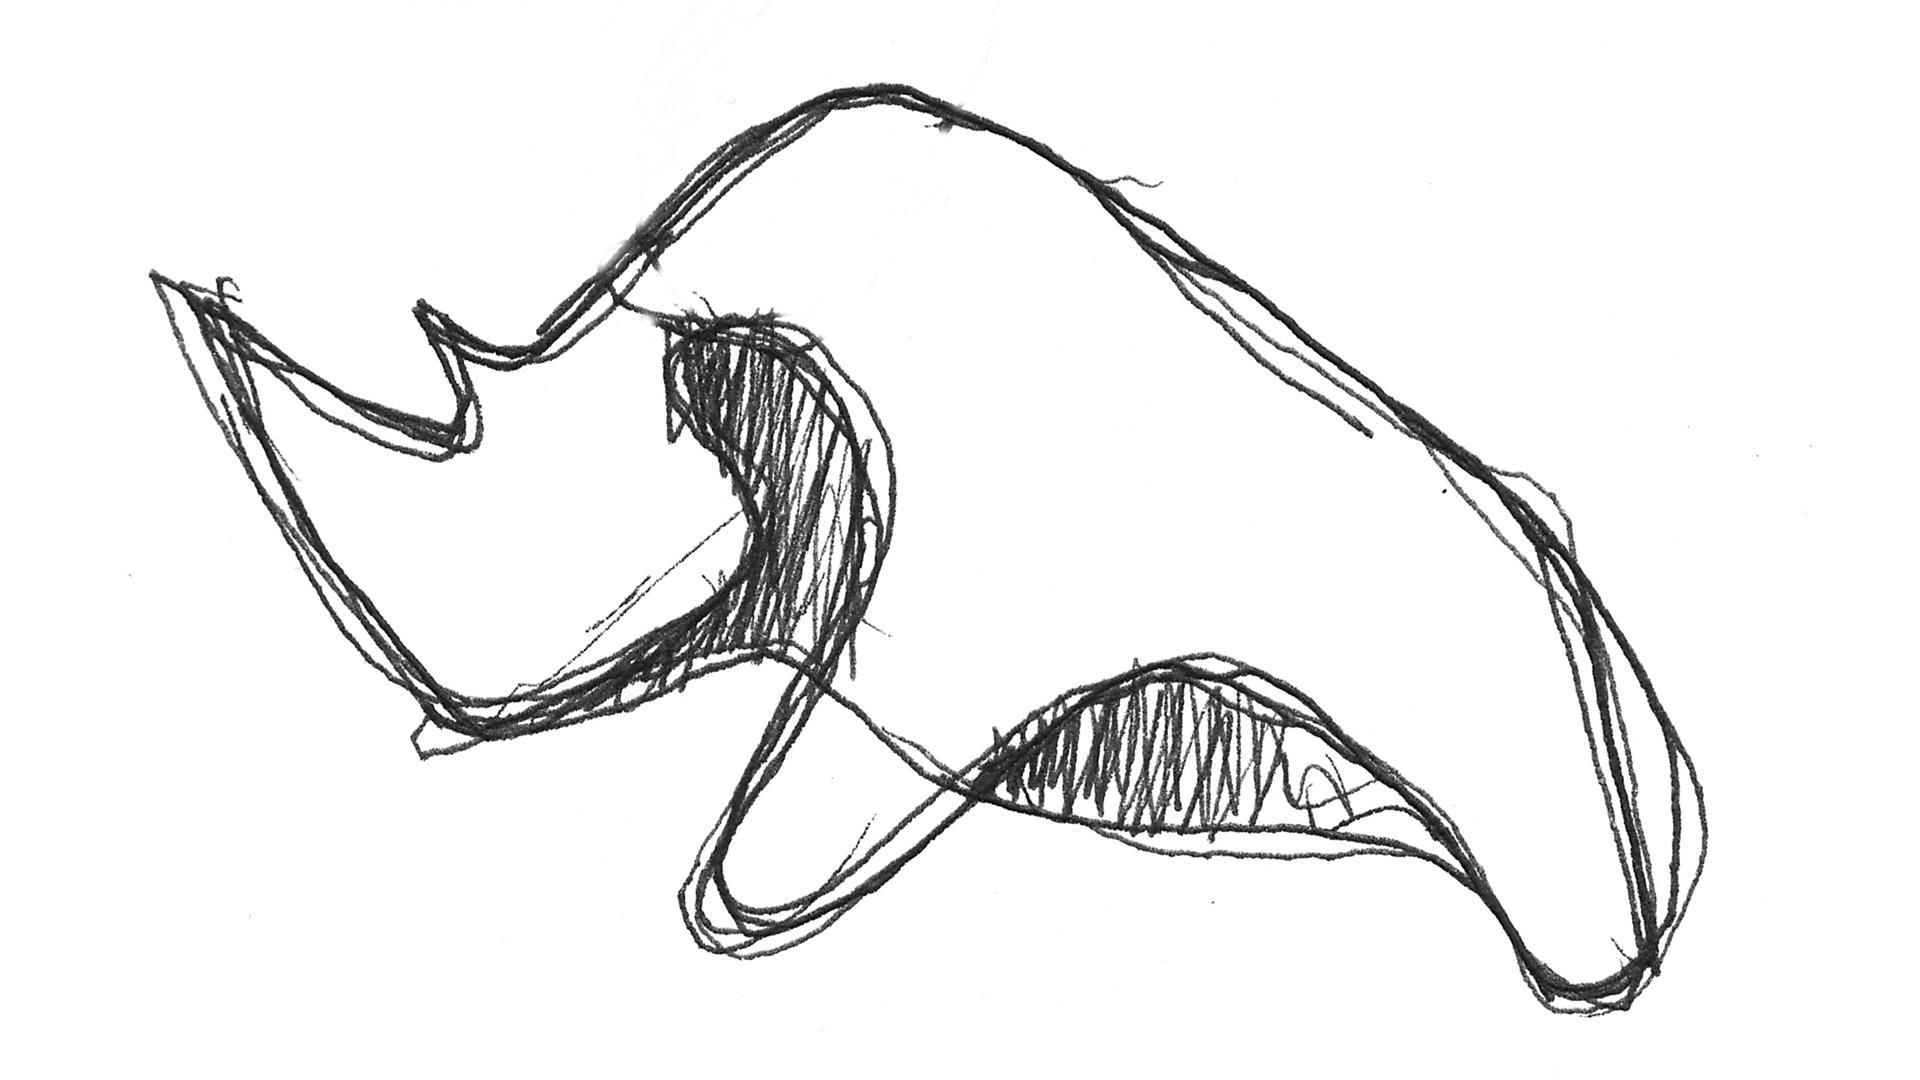 Rhino_sketch_for_Certificate_1920pix.jpg